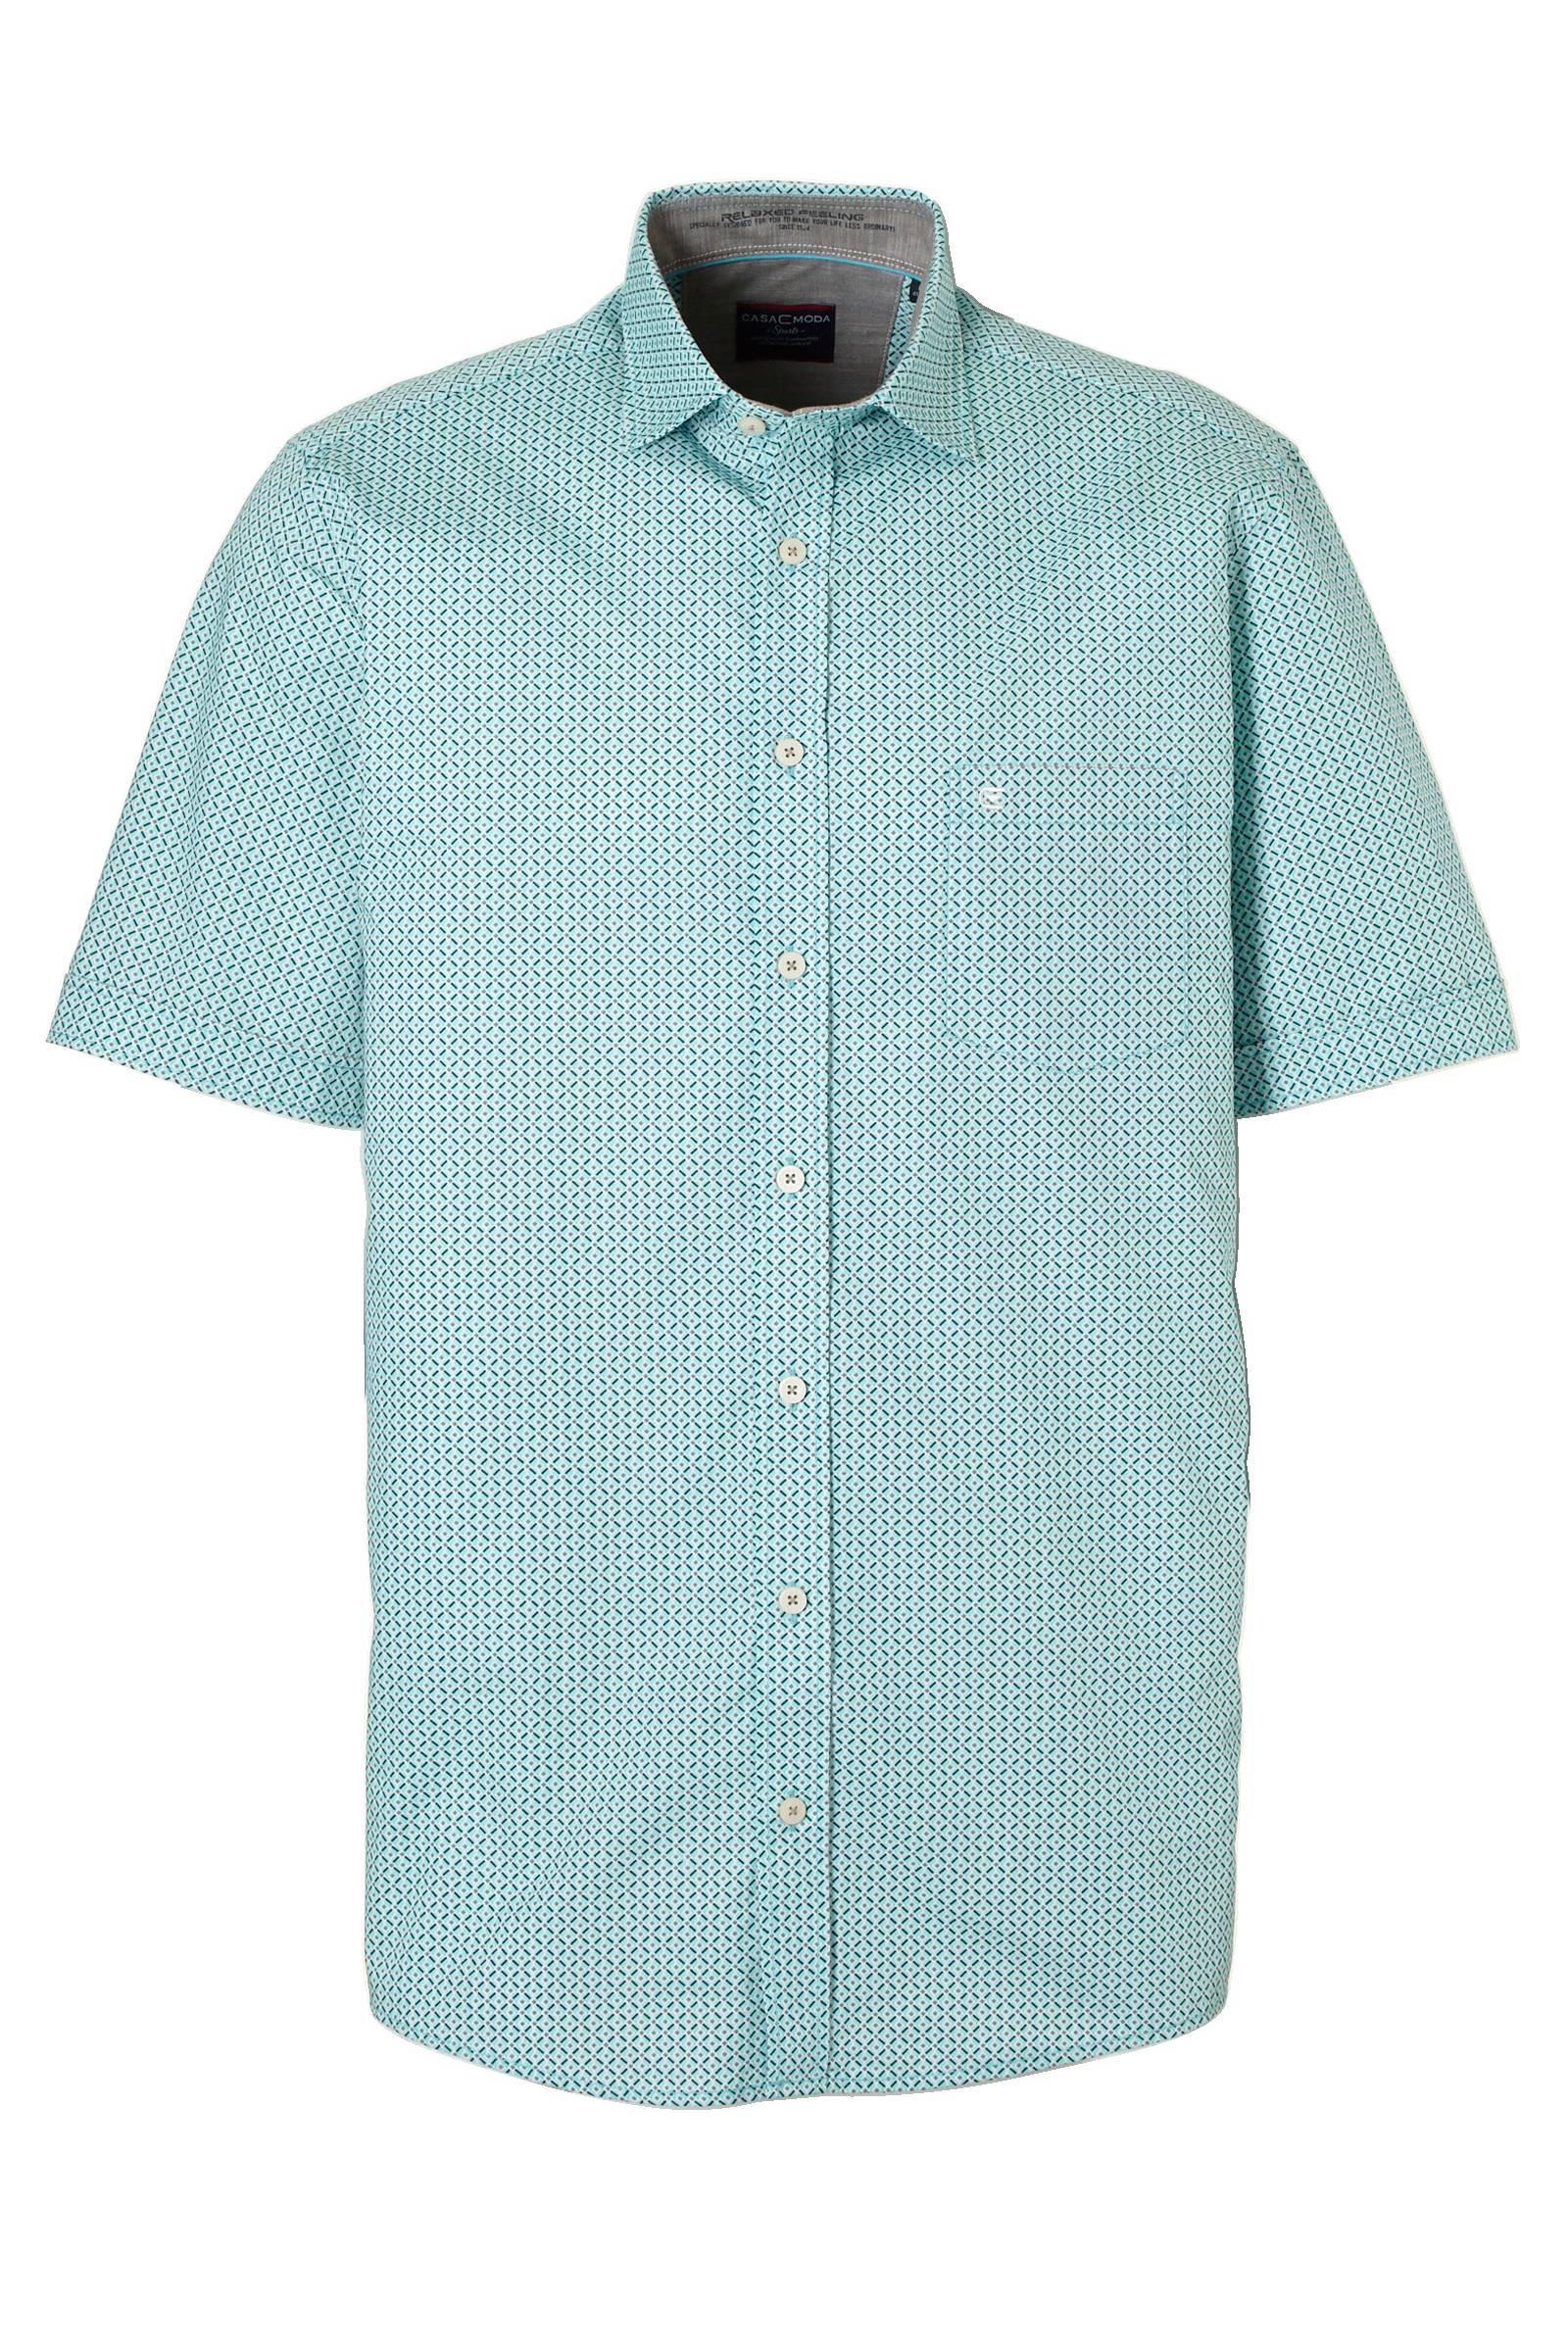 Casa Moda +size regular fit overhemd (heren)